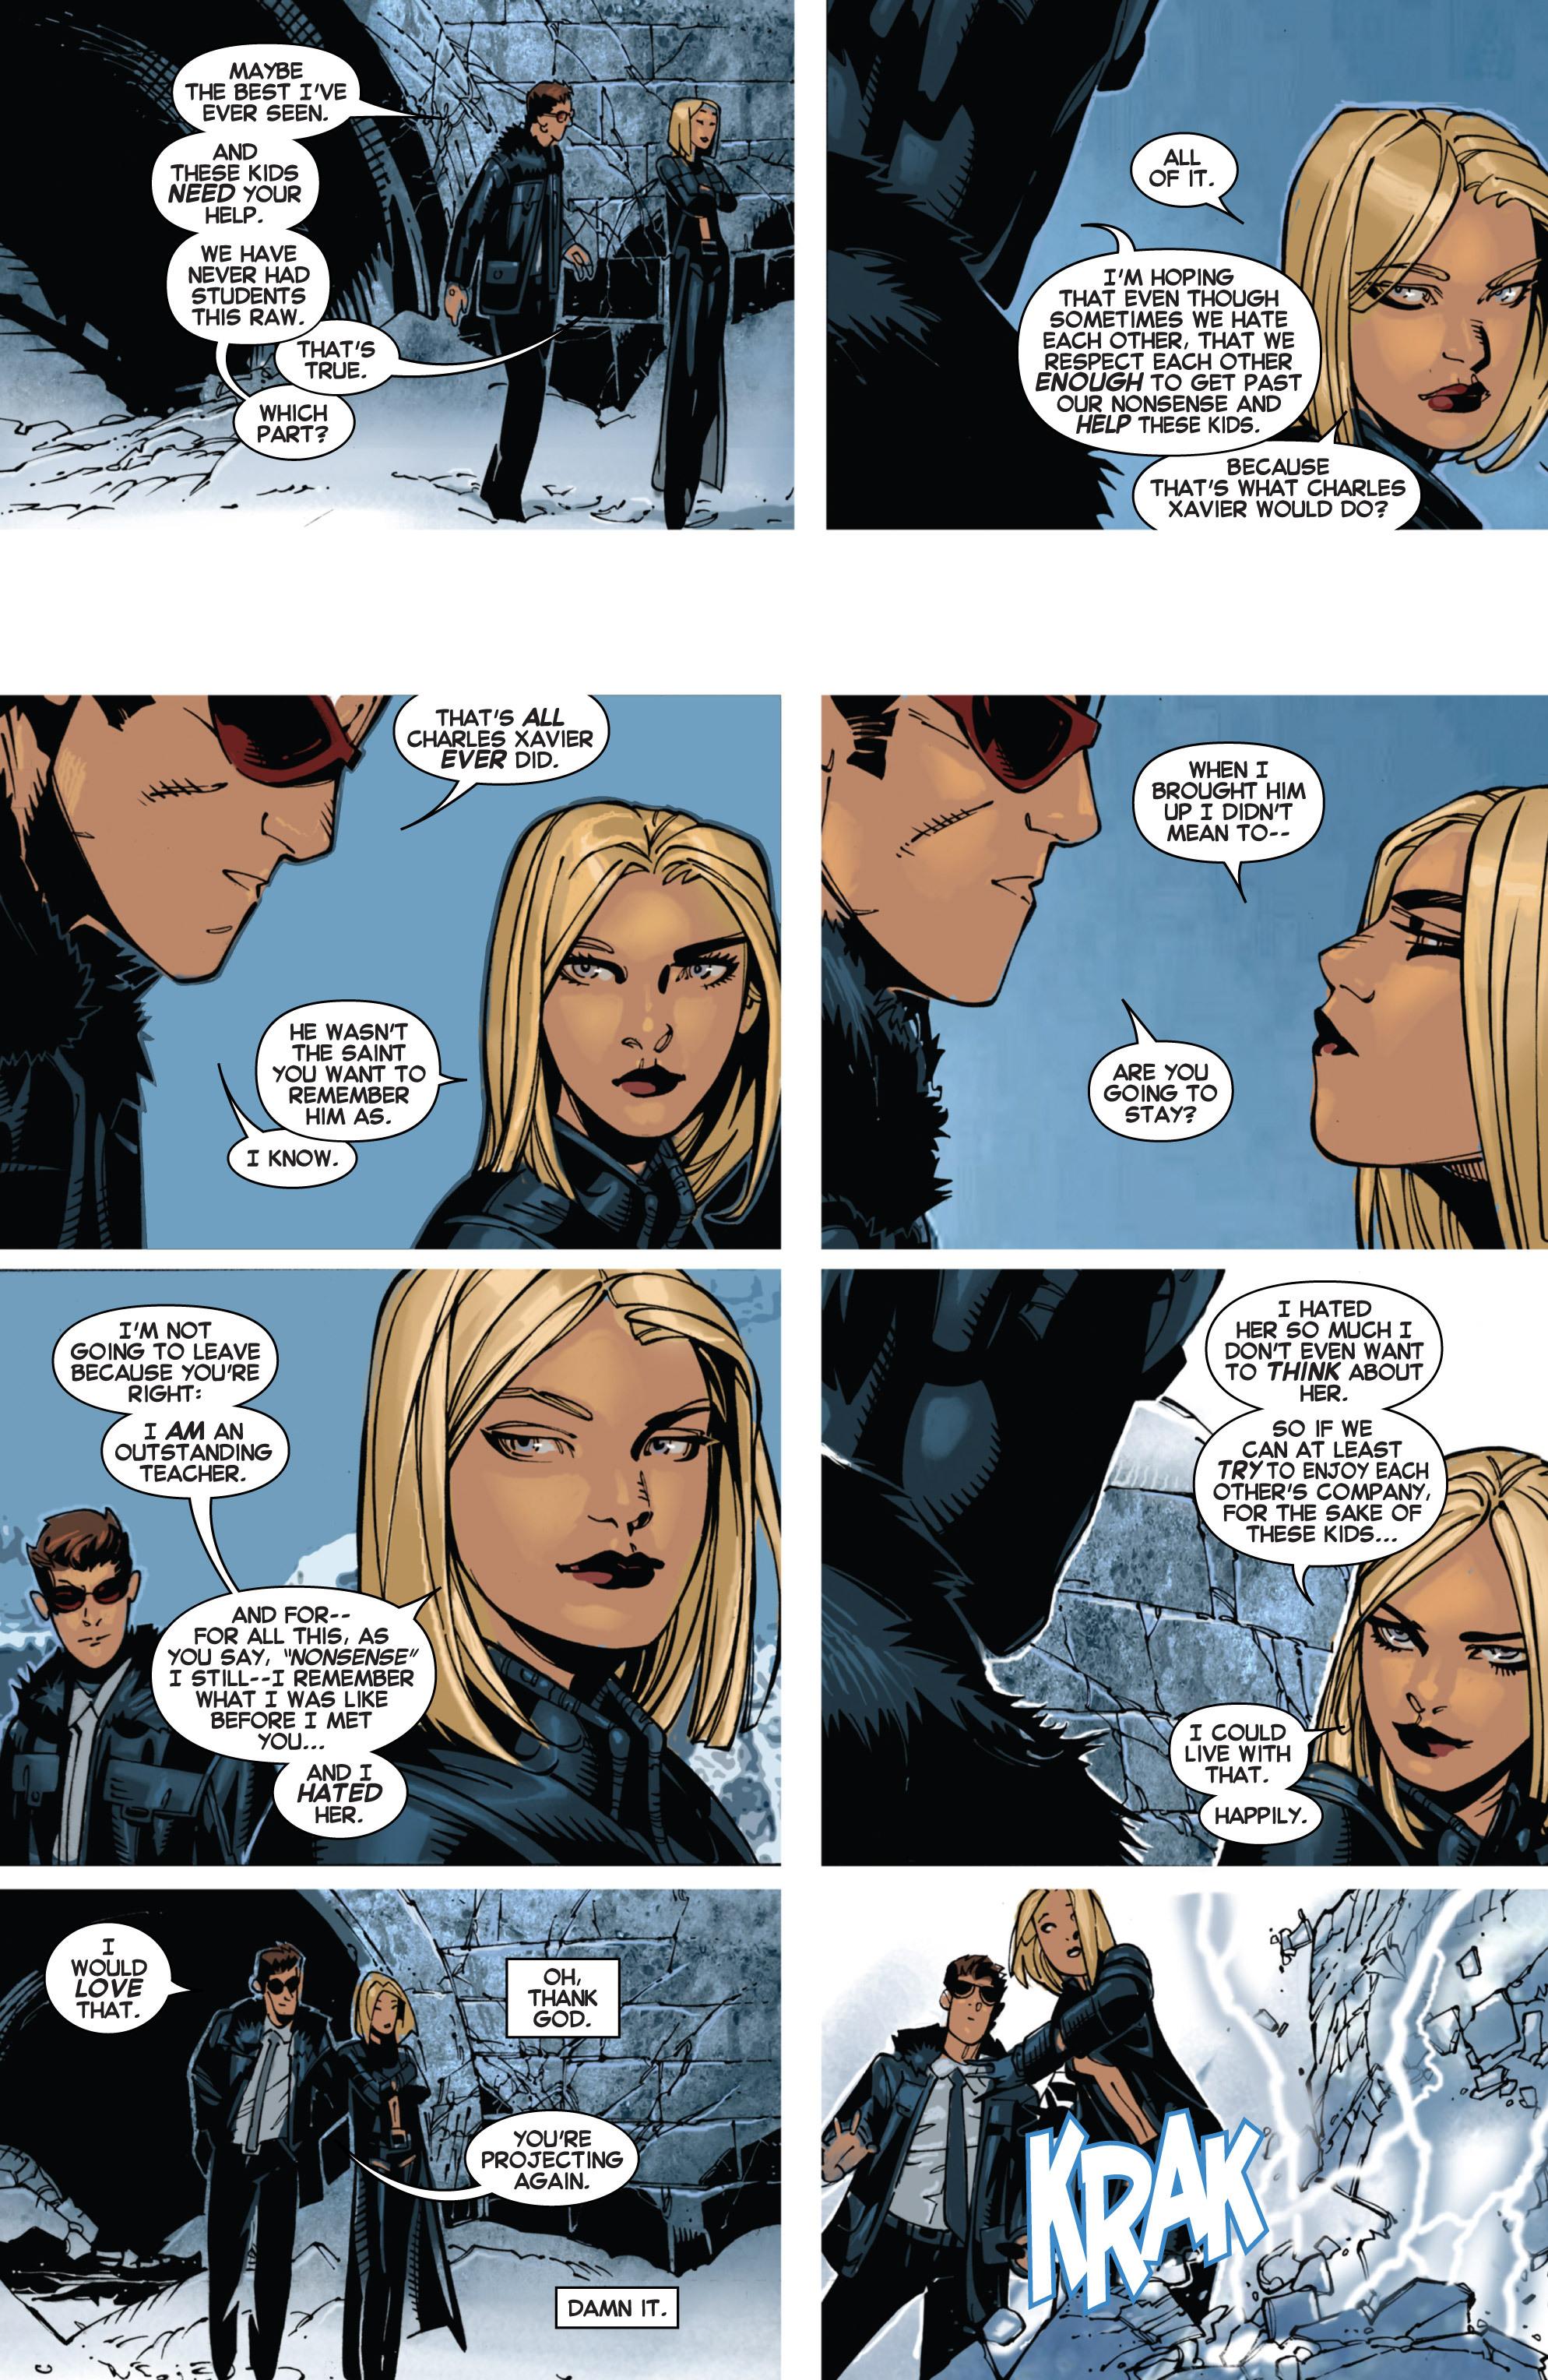 Read online Uncanny X-Men (2013) comic -  Issue # _TPB 1 - Revolution - 31